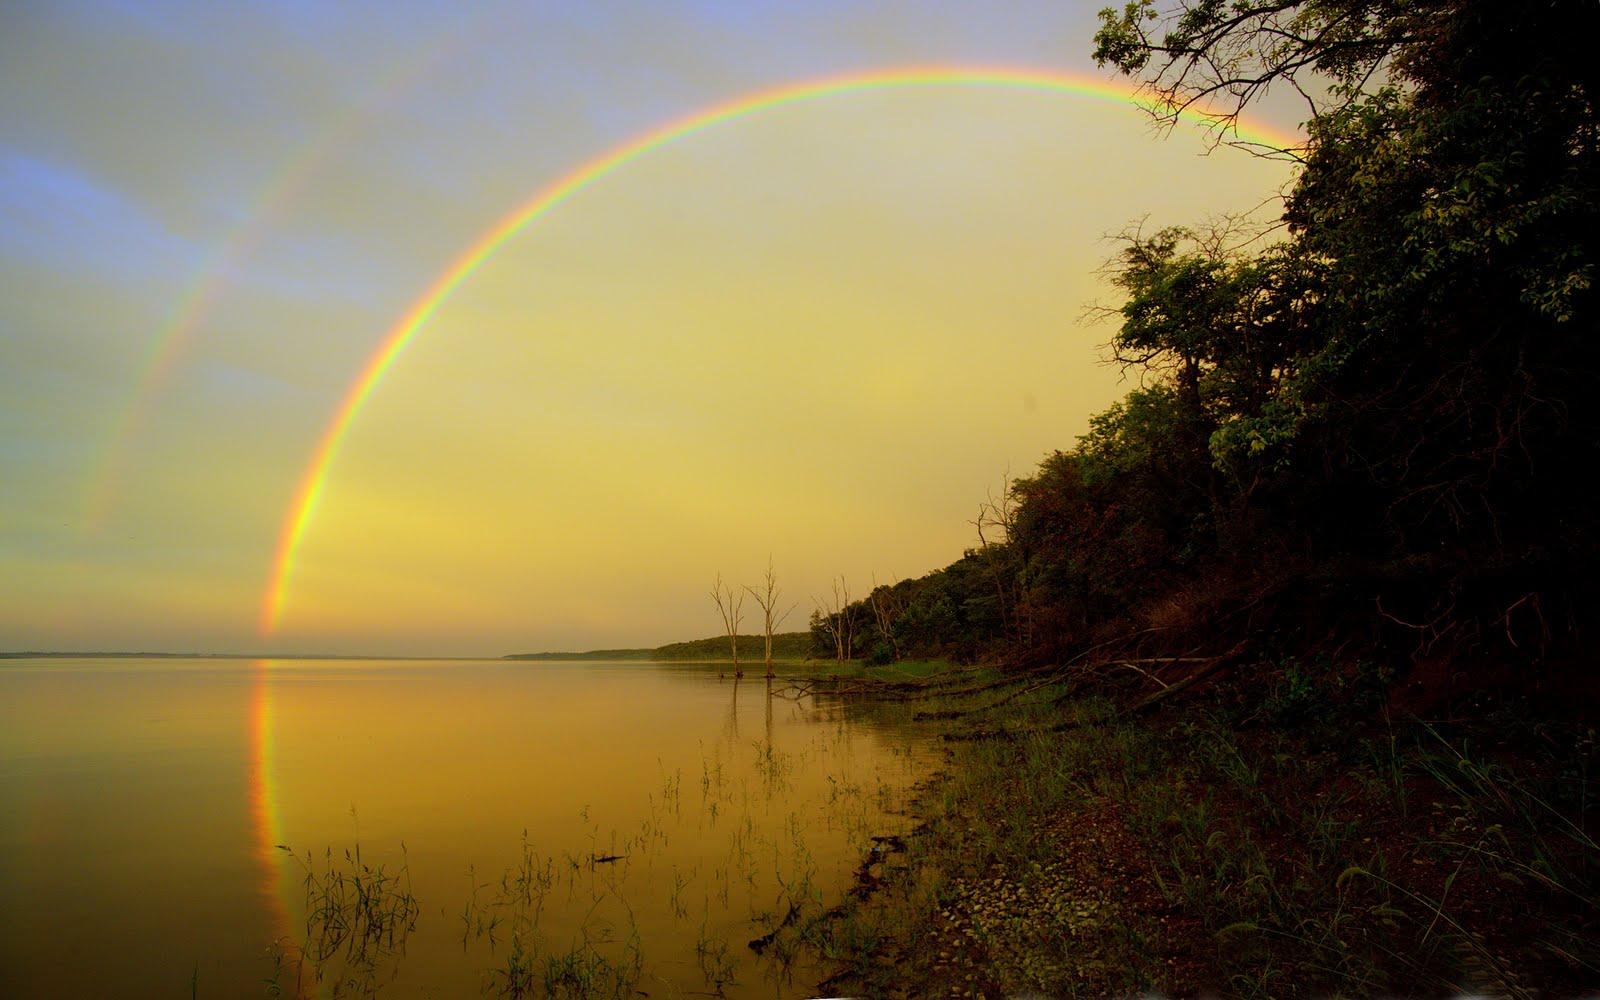 http://1.bp.blogspot.com/-H8caLAm7phY/TiMiMInVFMI/AAAAAAAACM4/bbfxv5Cw4HY/s1600/rainbow_hd_wallpaper_6.jpg